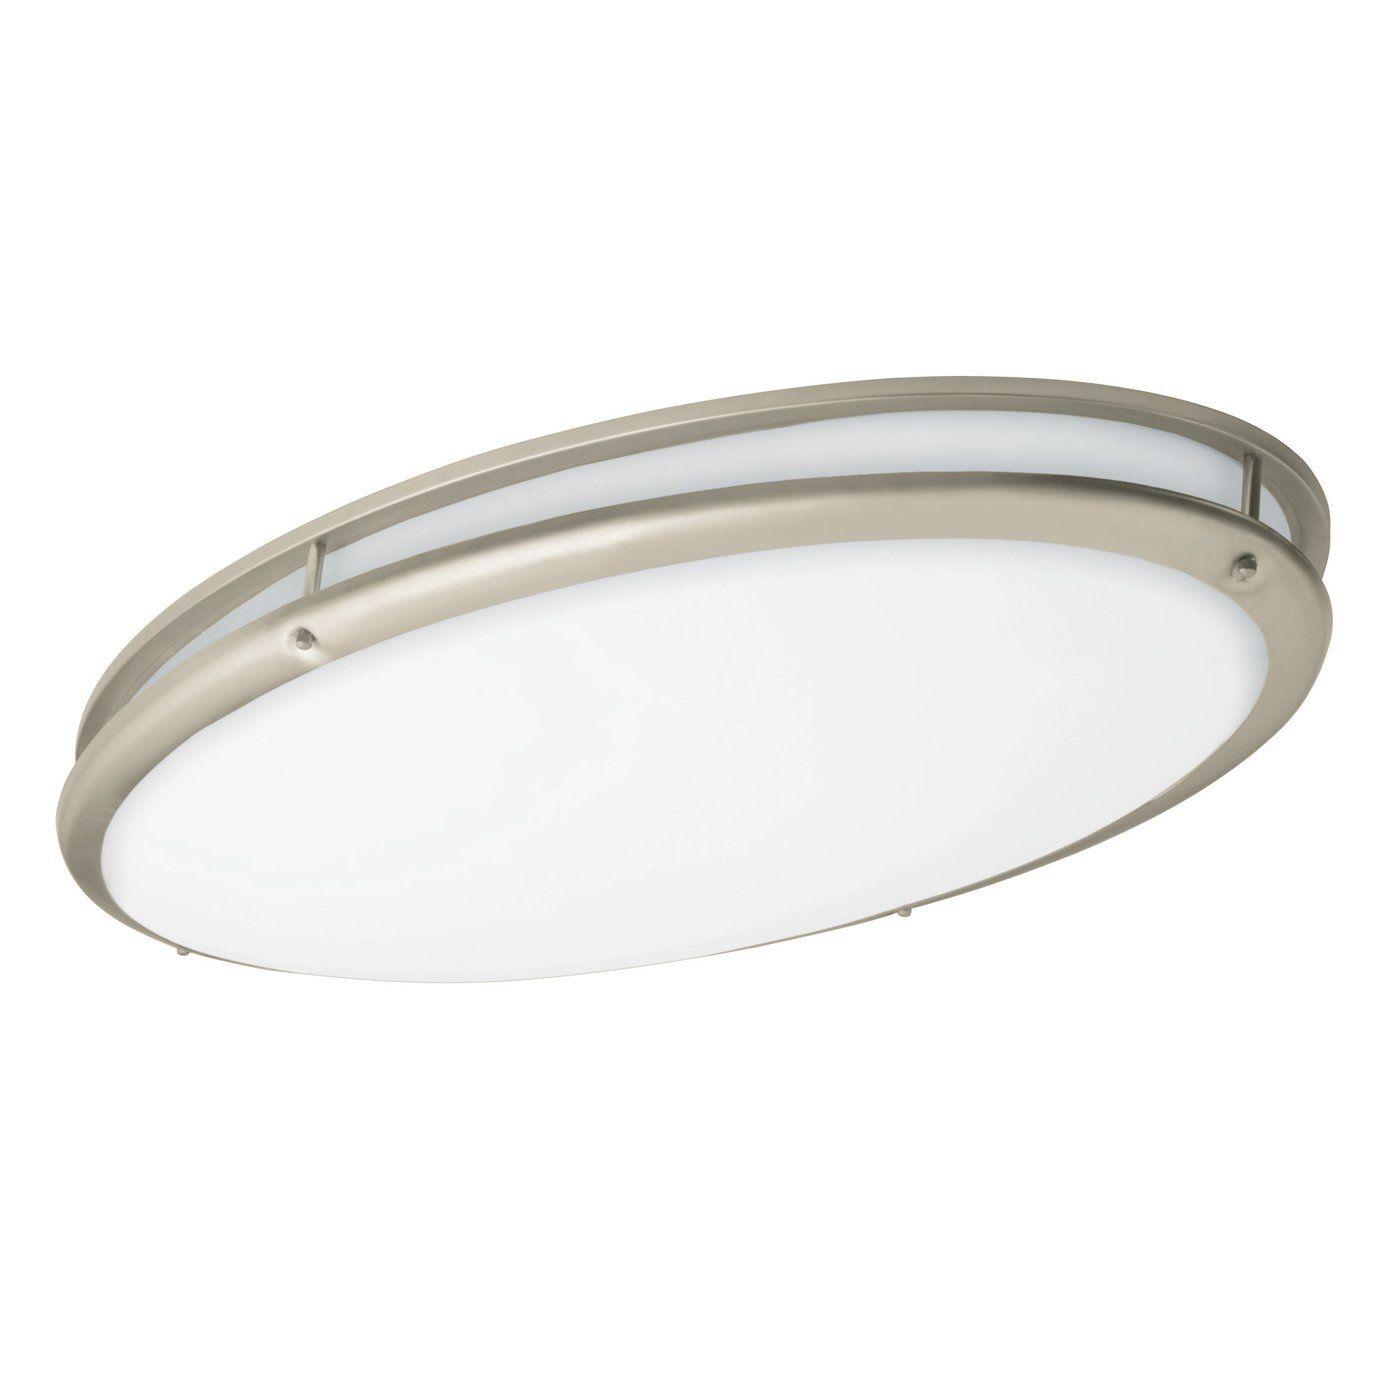 48 Best Kitchen Lighting Fixtures: In Bronze AFX Lighting CSV3232 Contemporary Oval Flush